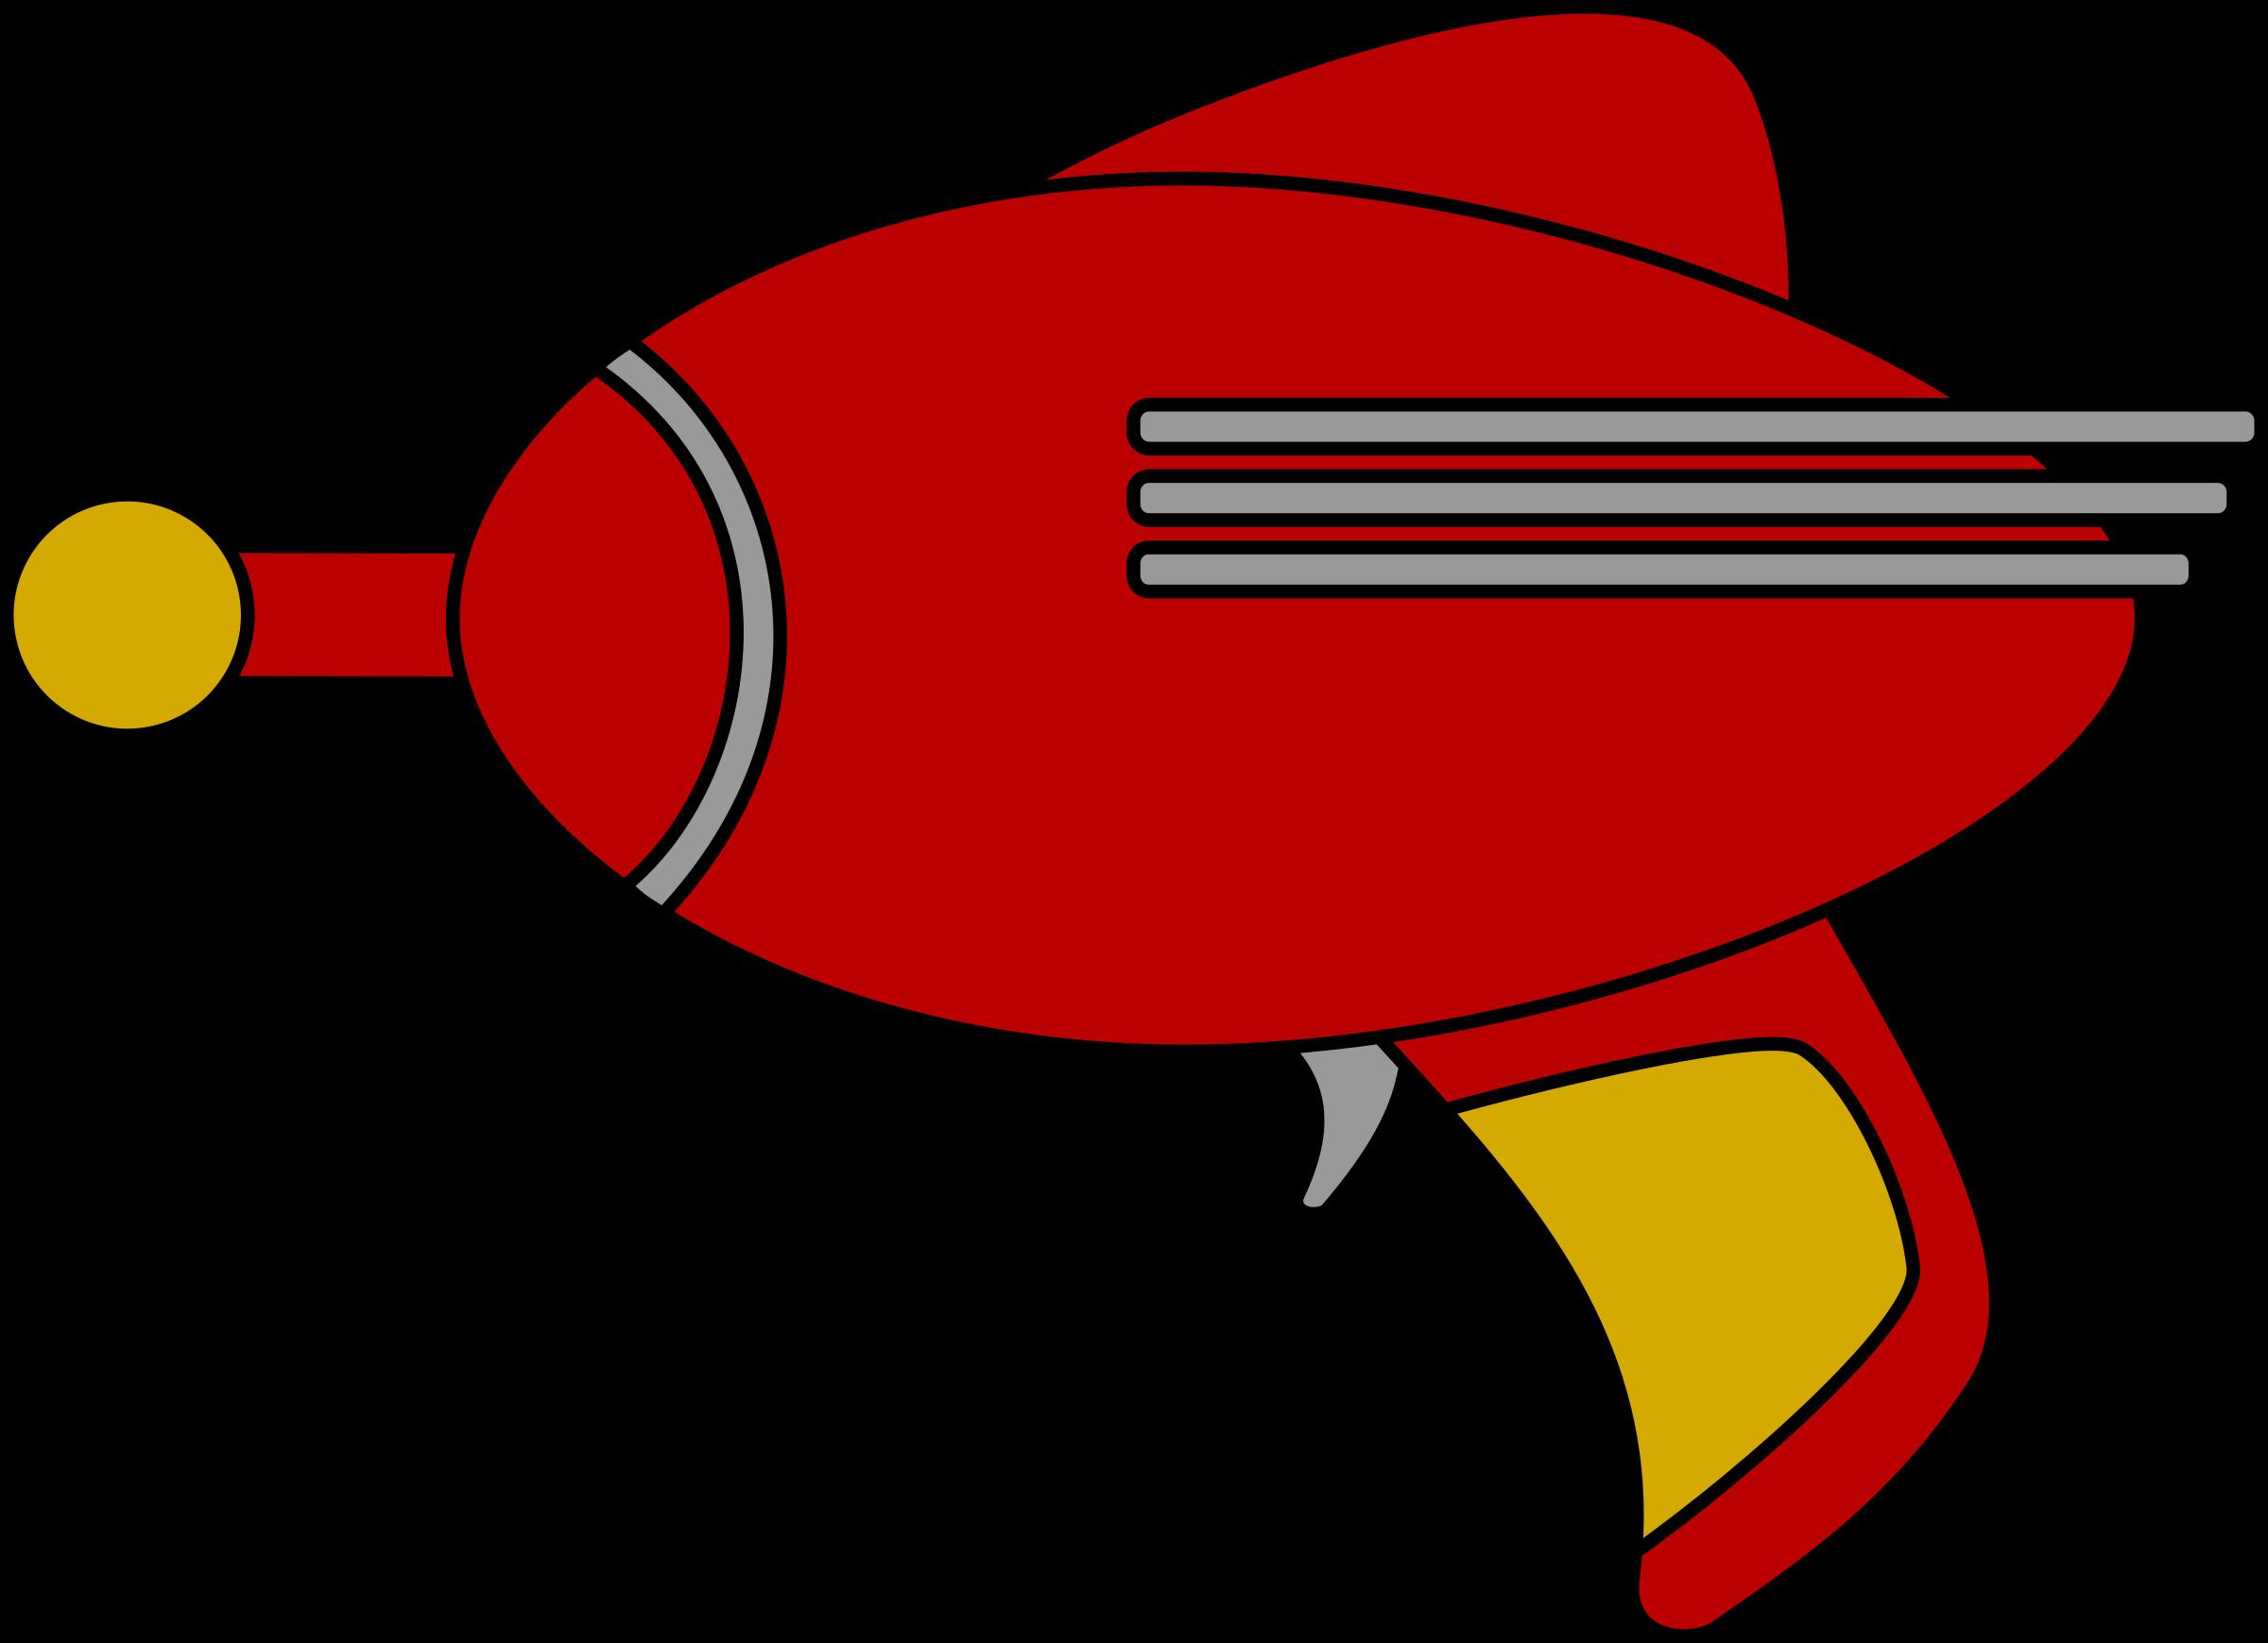 Ray big image png. Clipart gun red